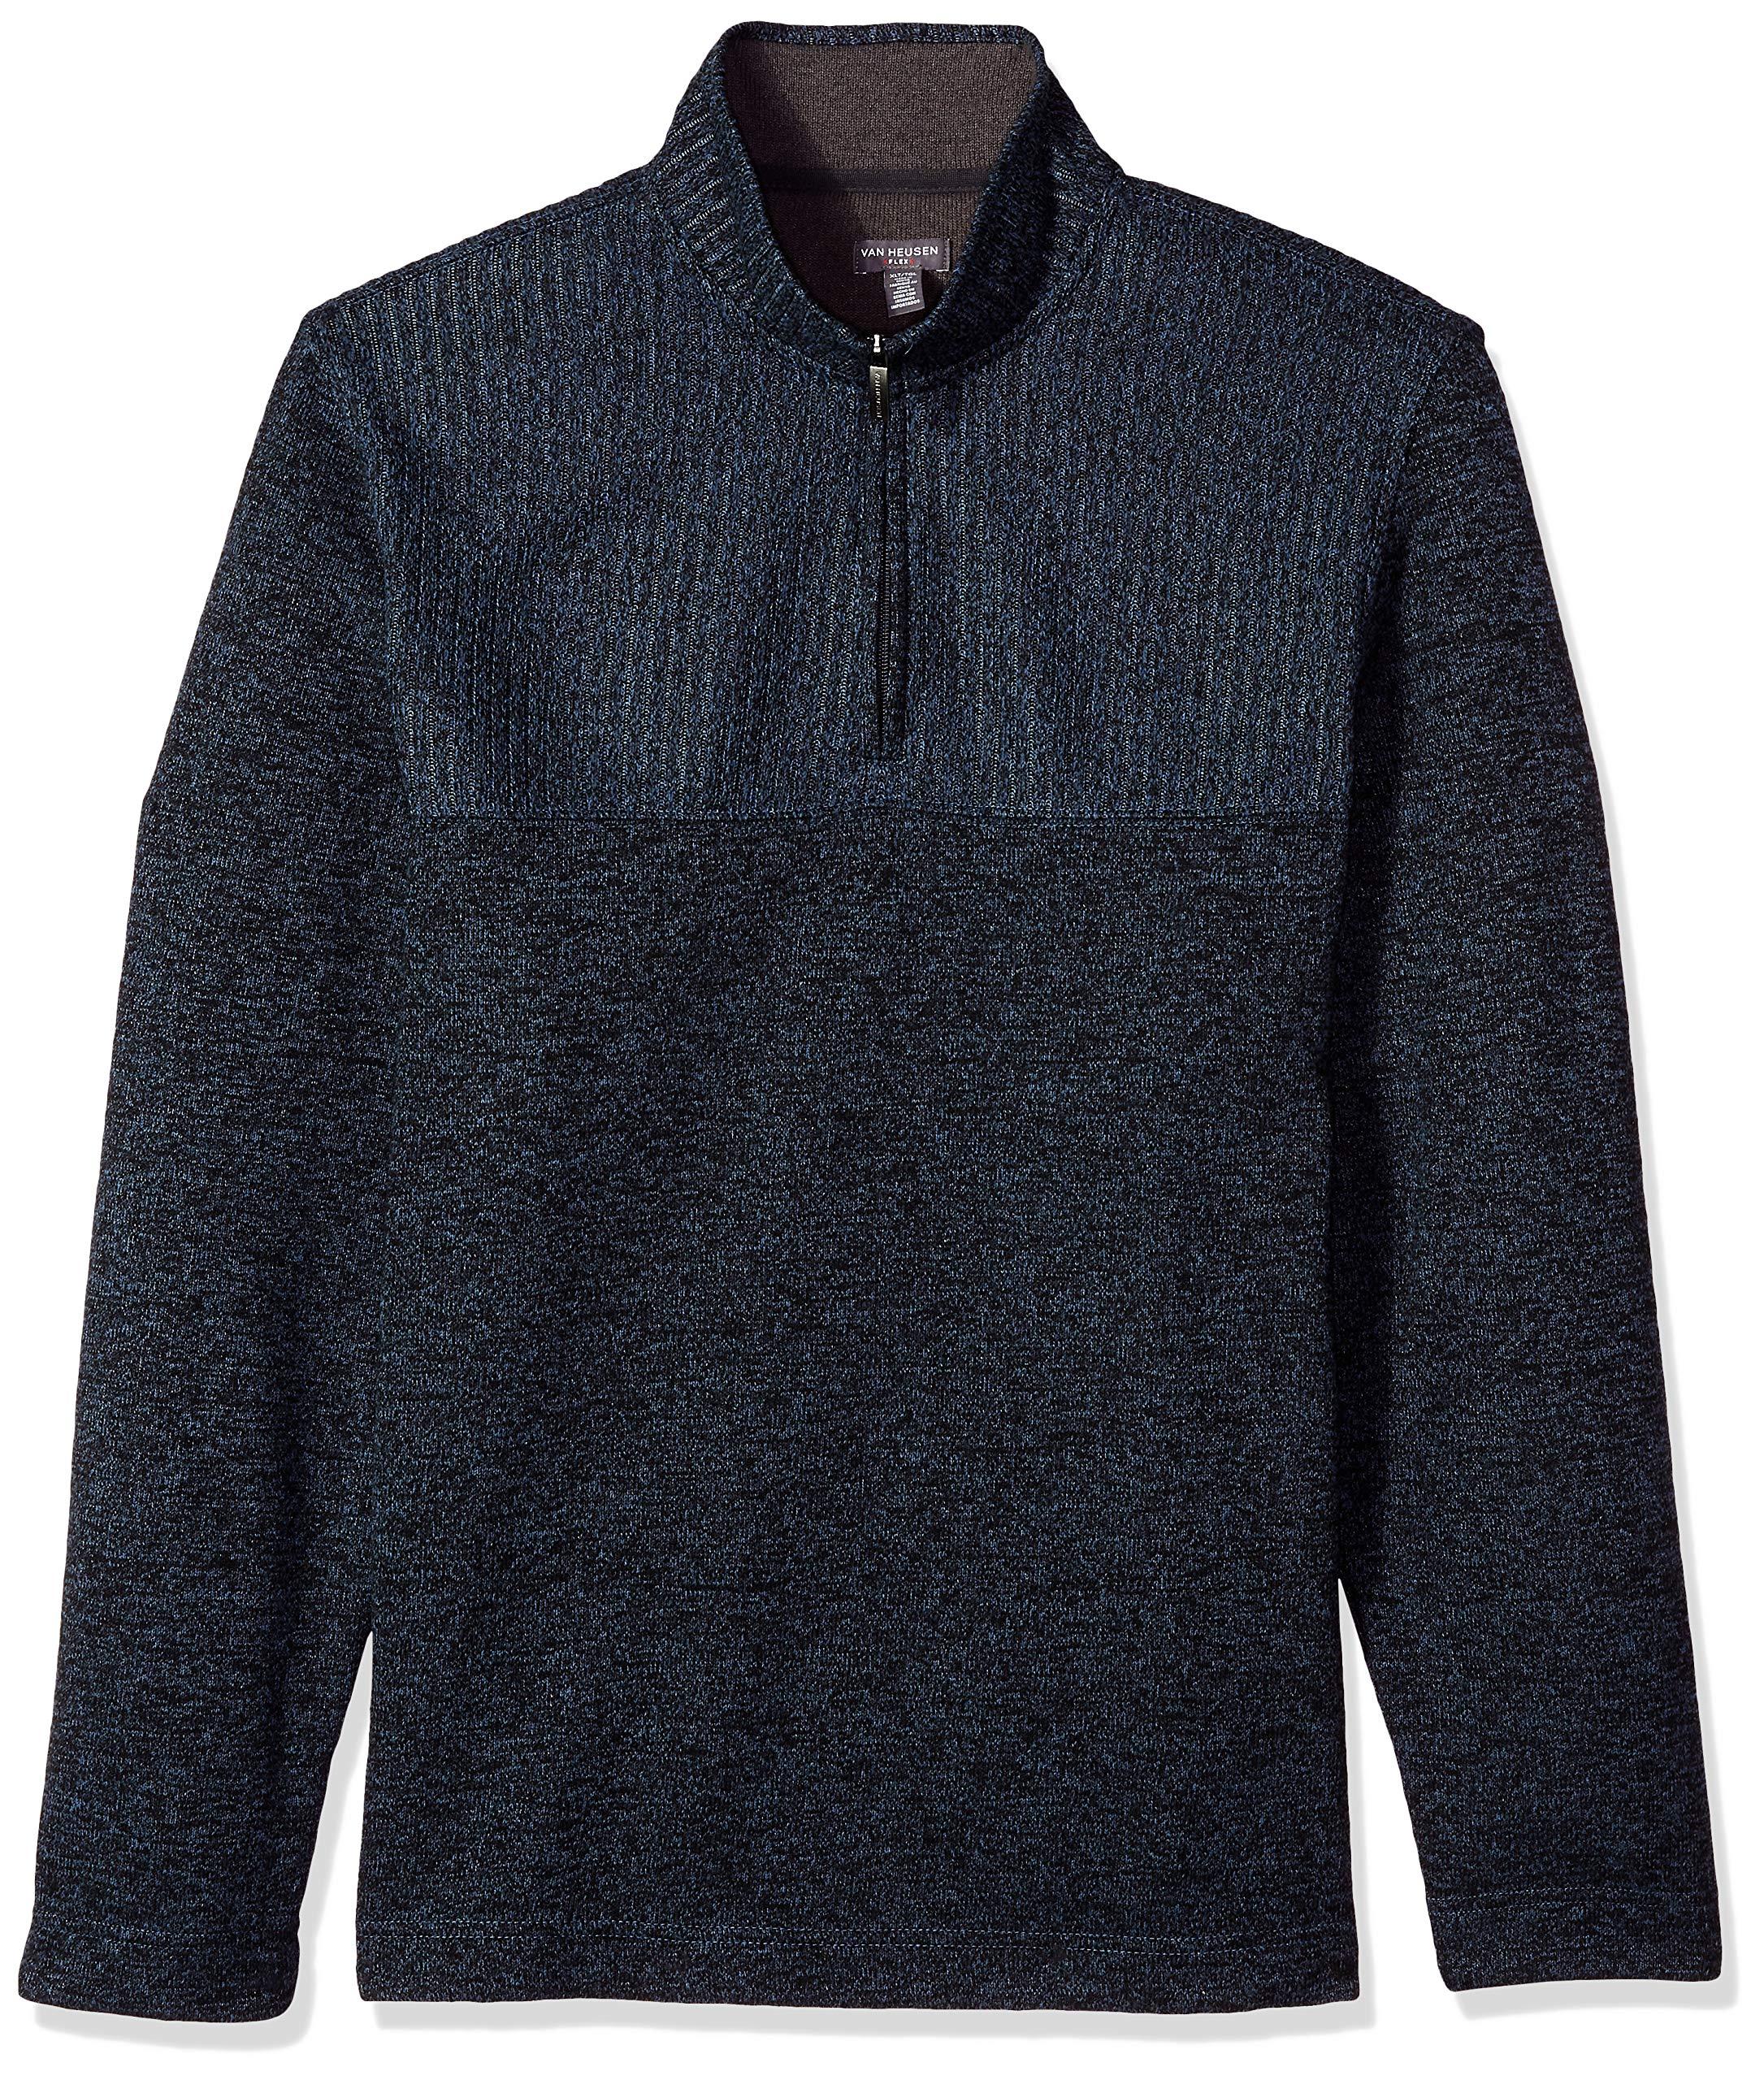 Van Heusen Men's Big Flex 1/4-Zip Solid Sweater, Blue Thunder, 3X-Large Tall